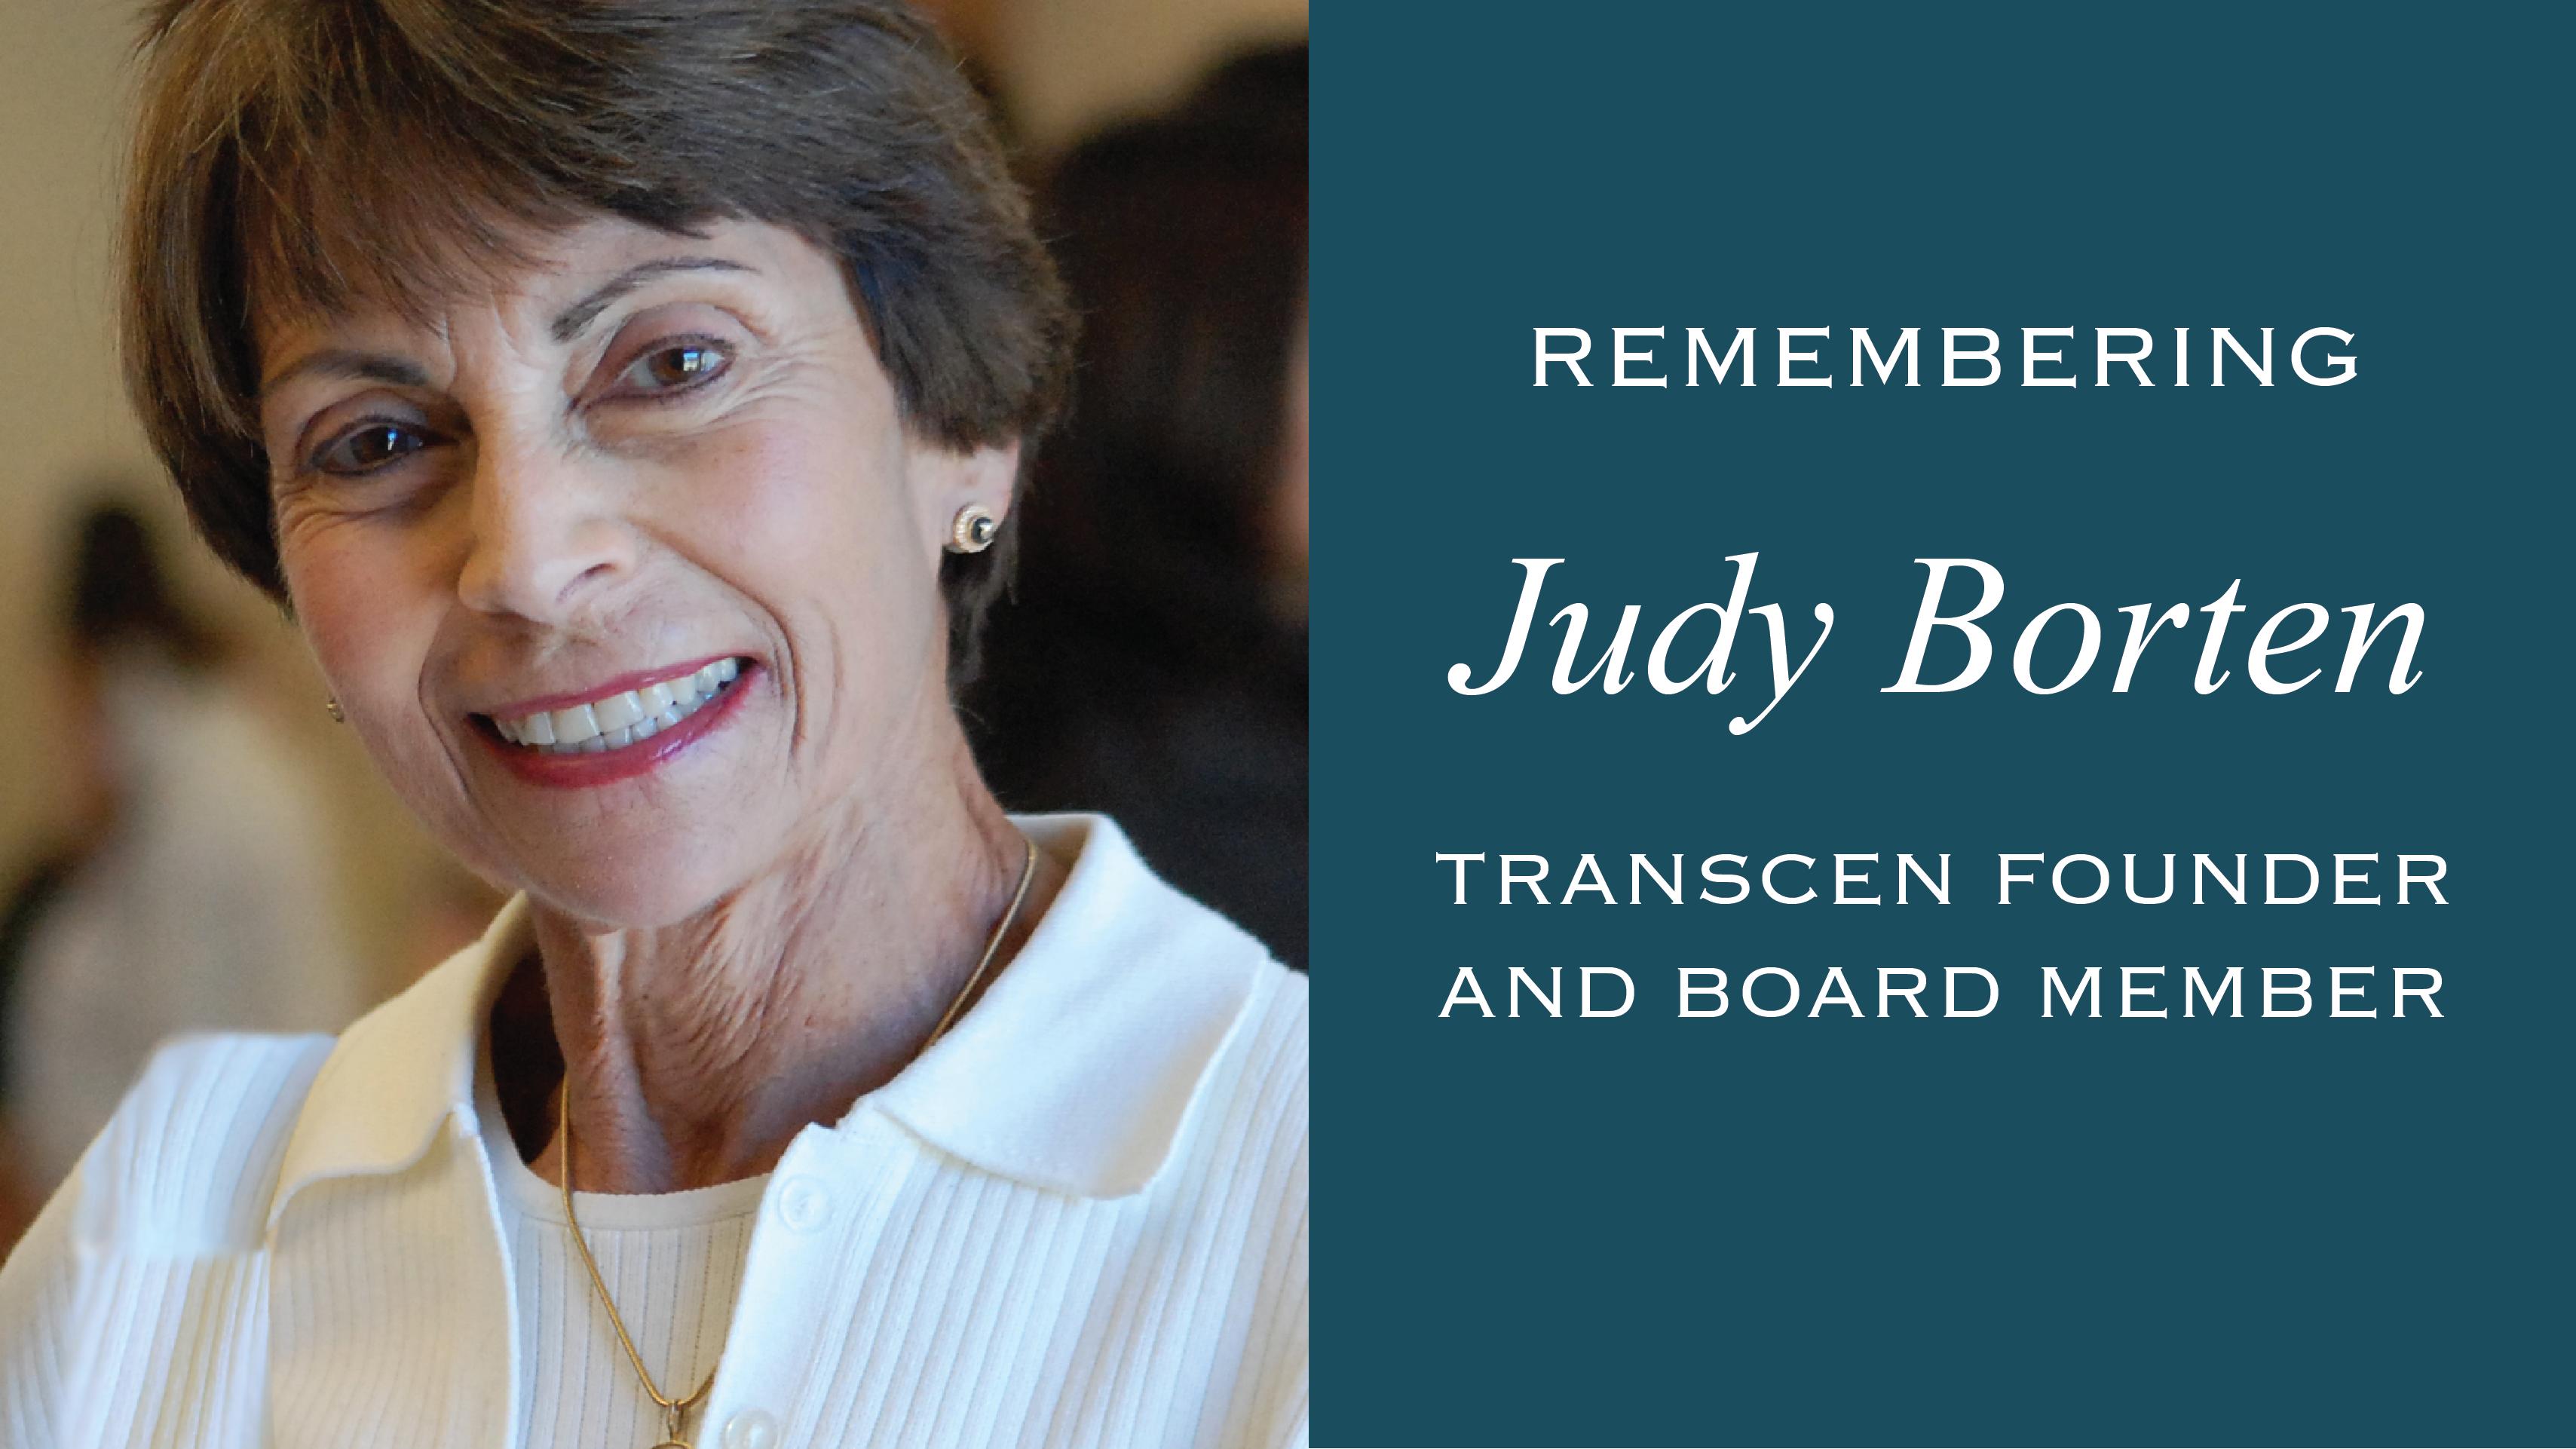 Remembering Judy Borten